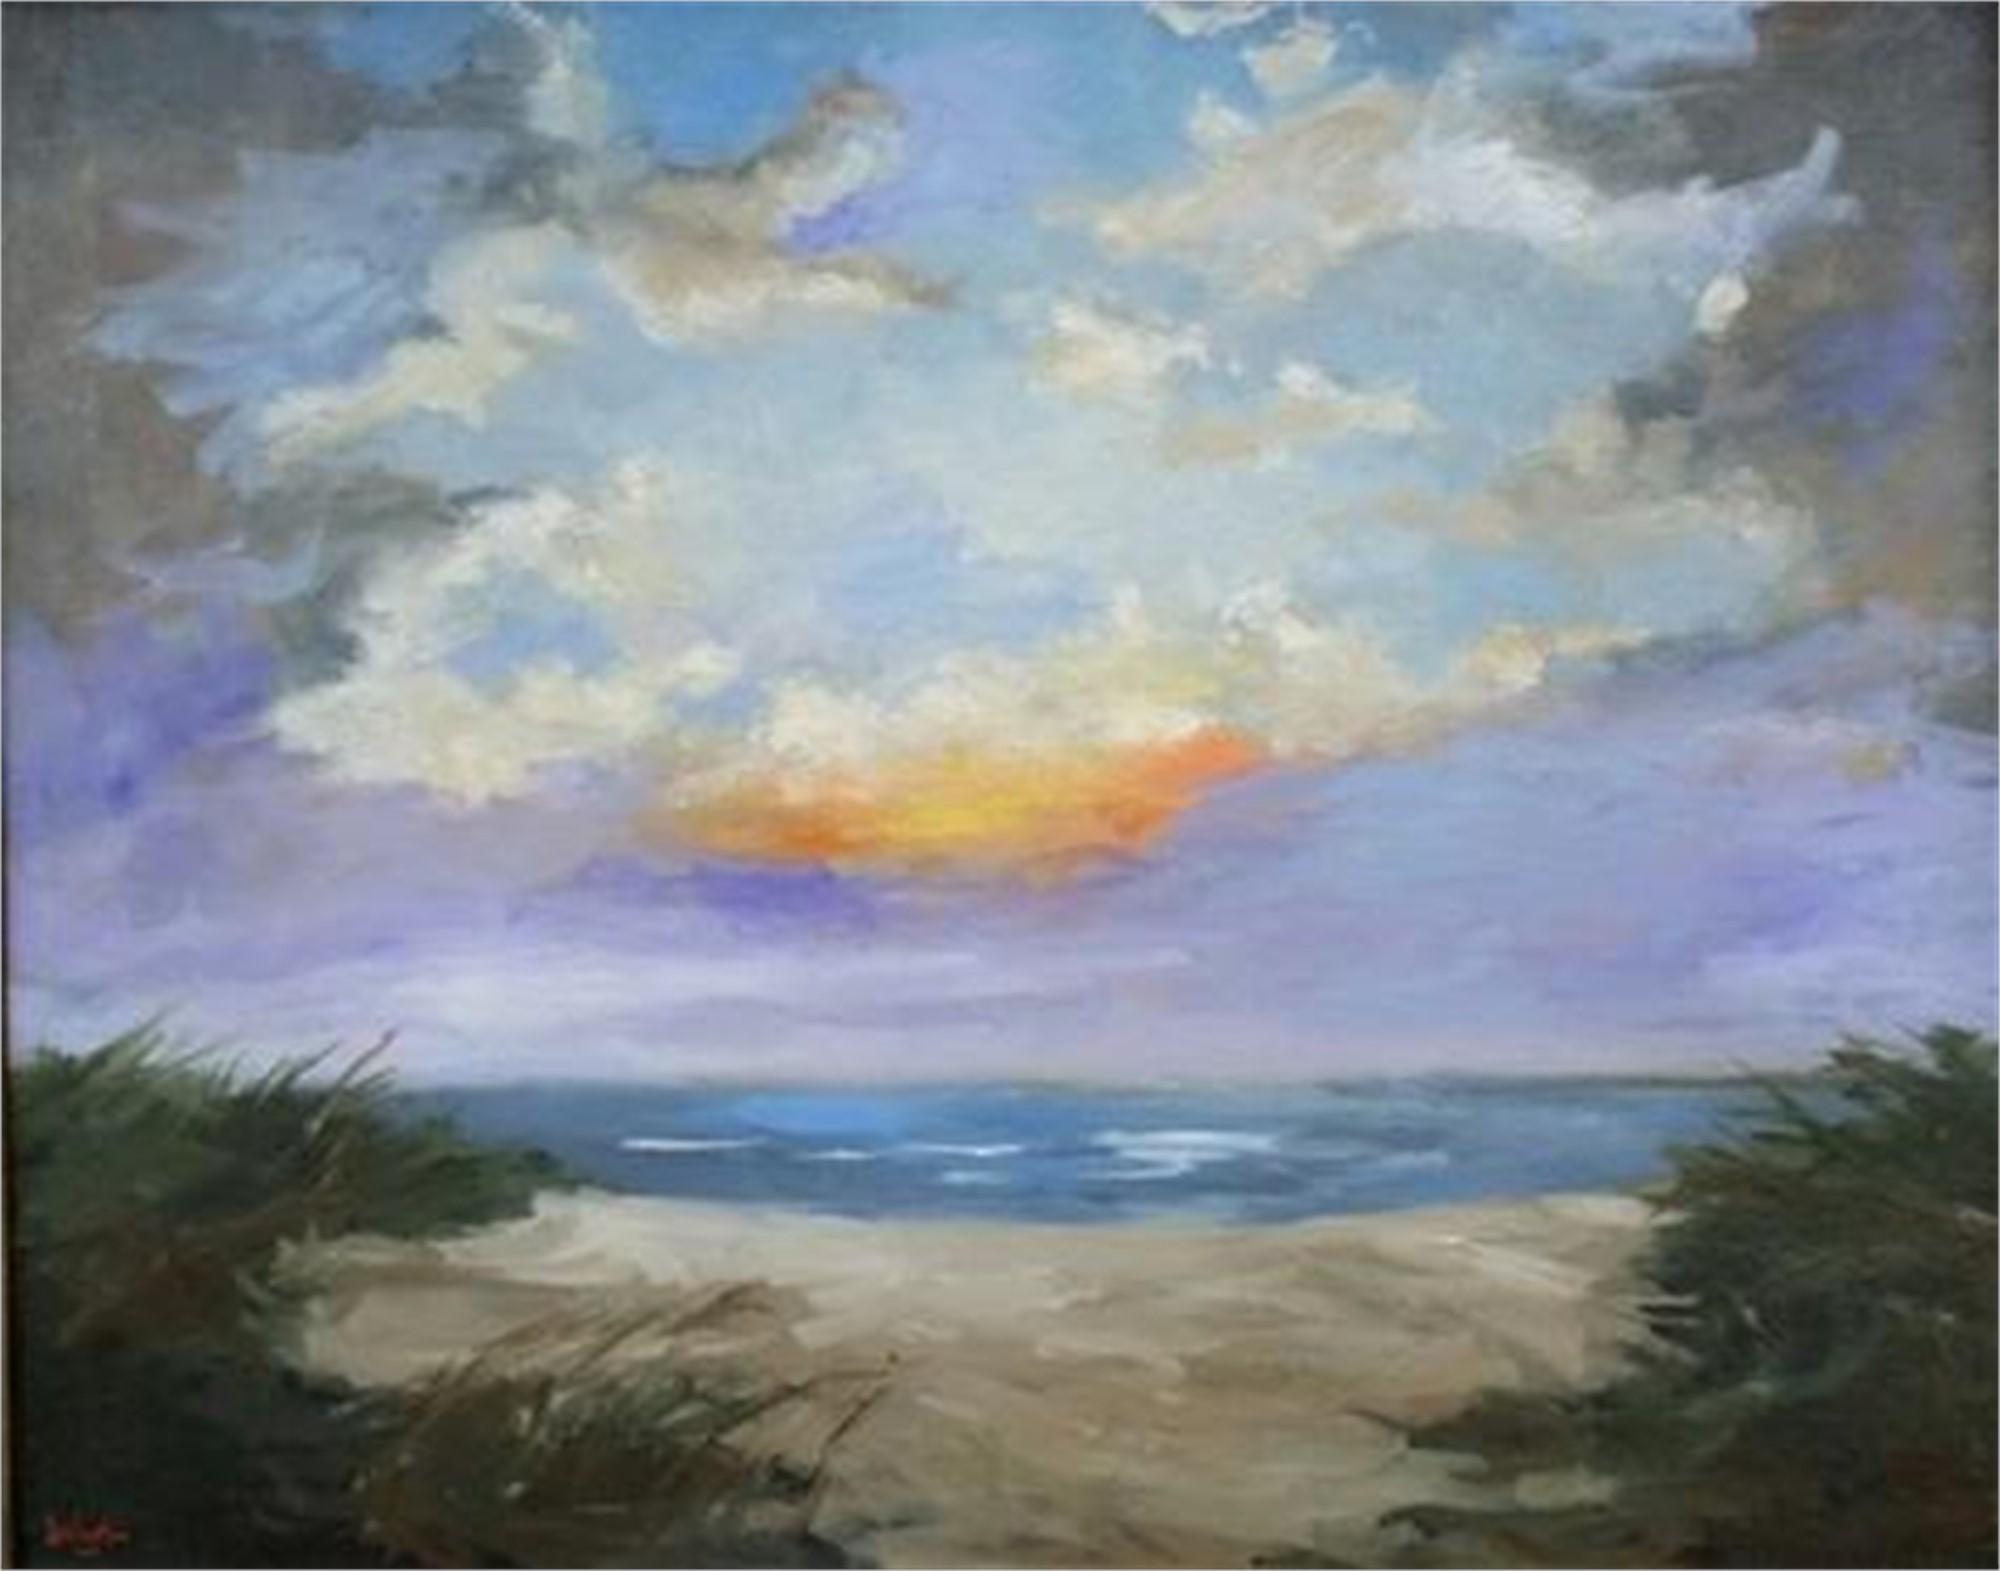 Sweet Spot by Jim Darlington